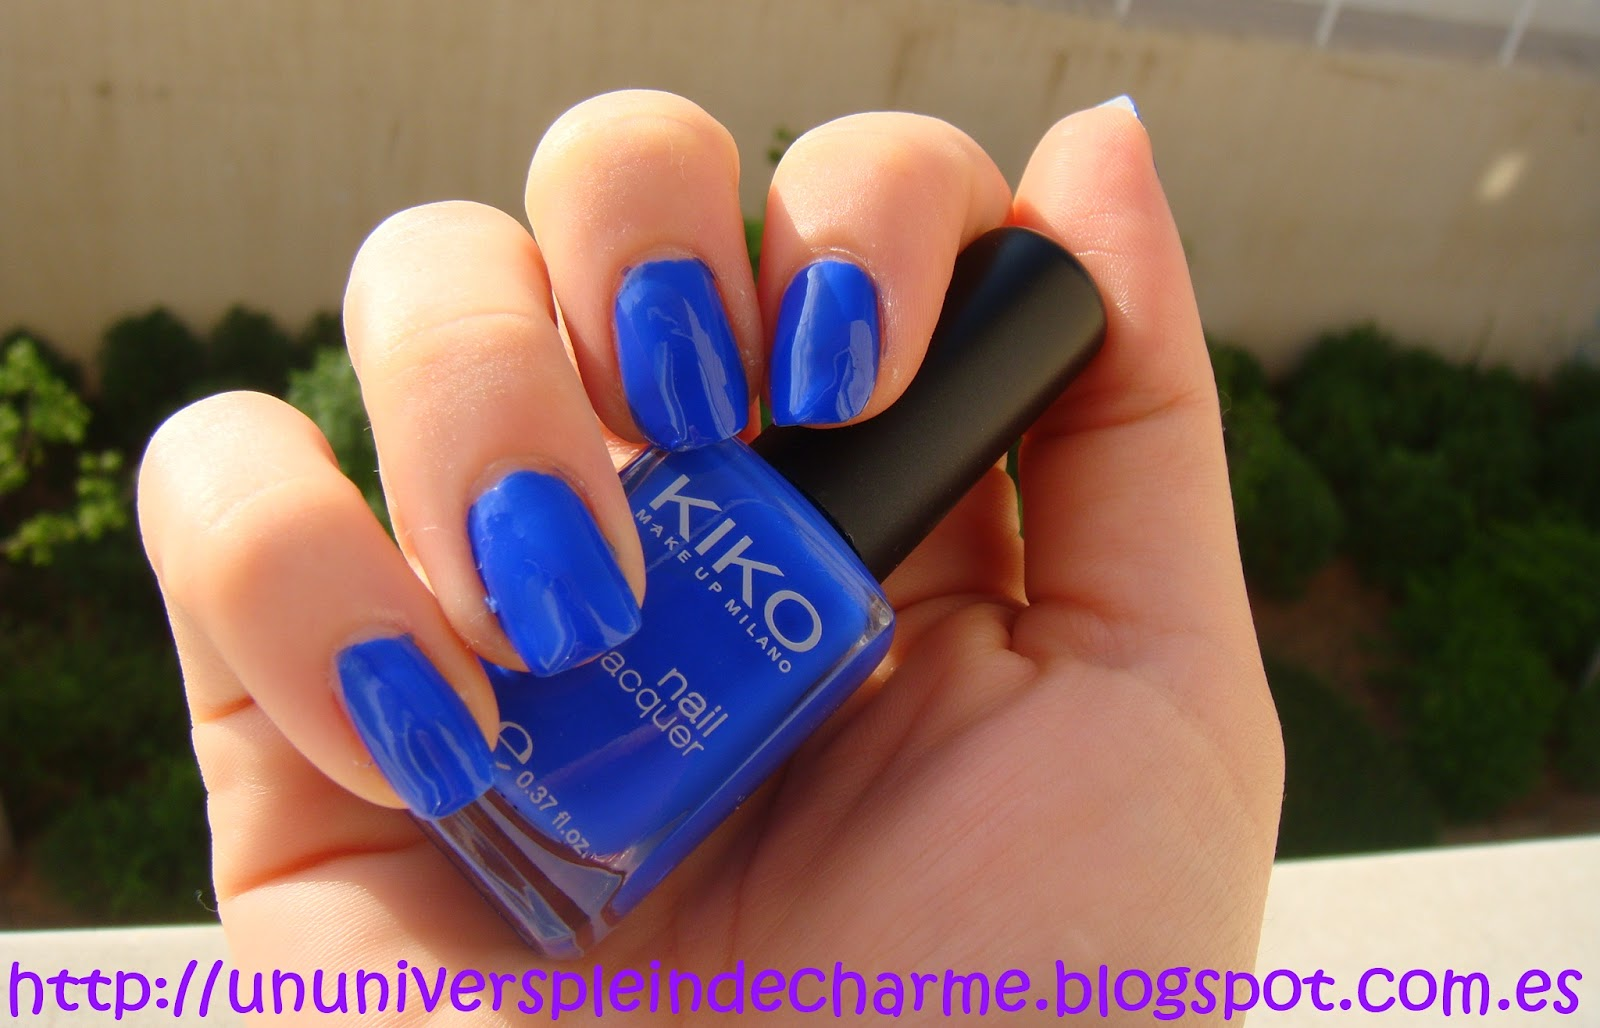 Mauvedelle: #336 de KIKO: Azul Vibrante